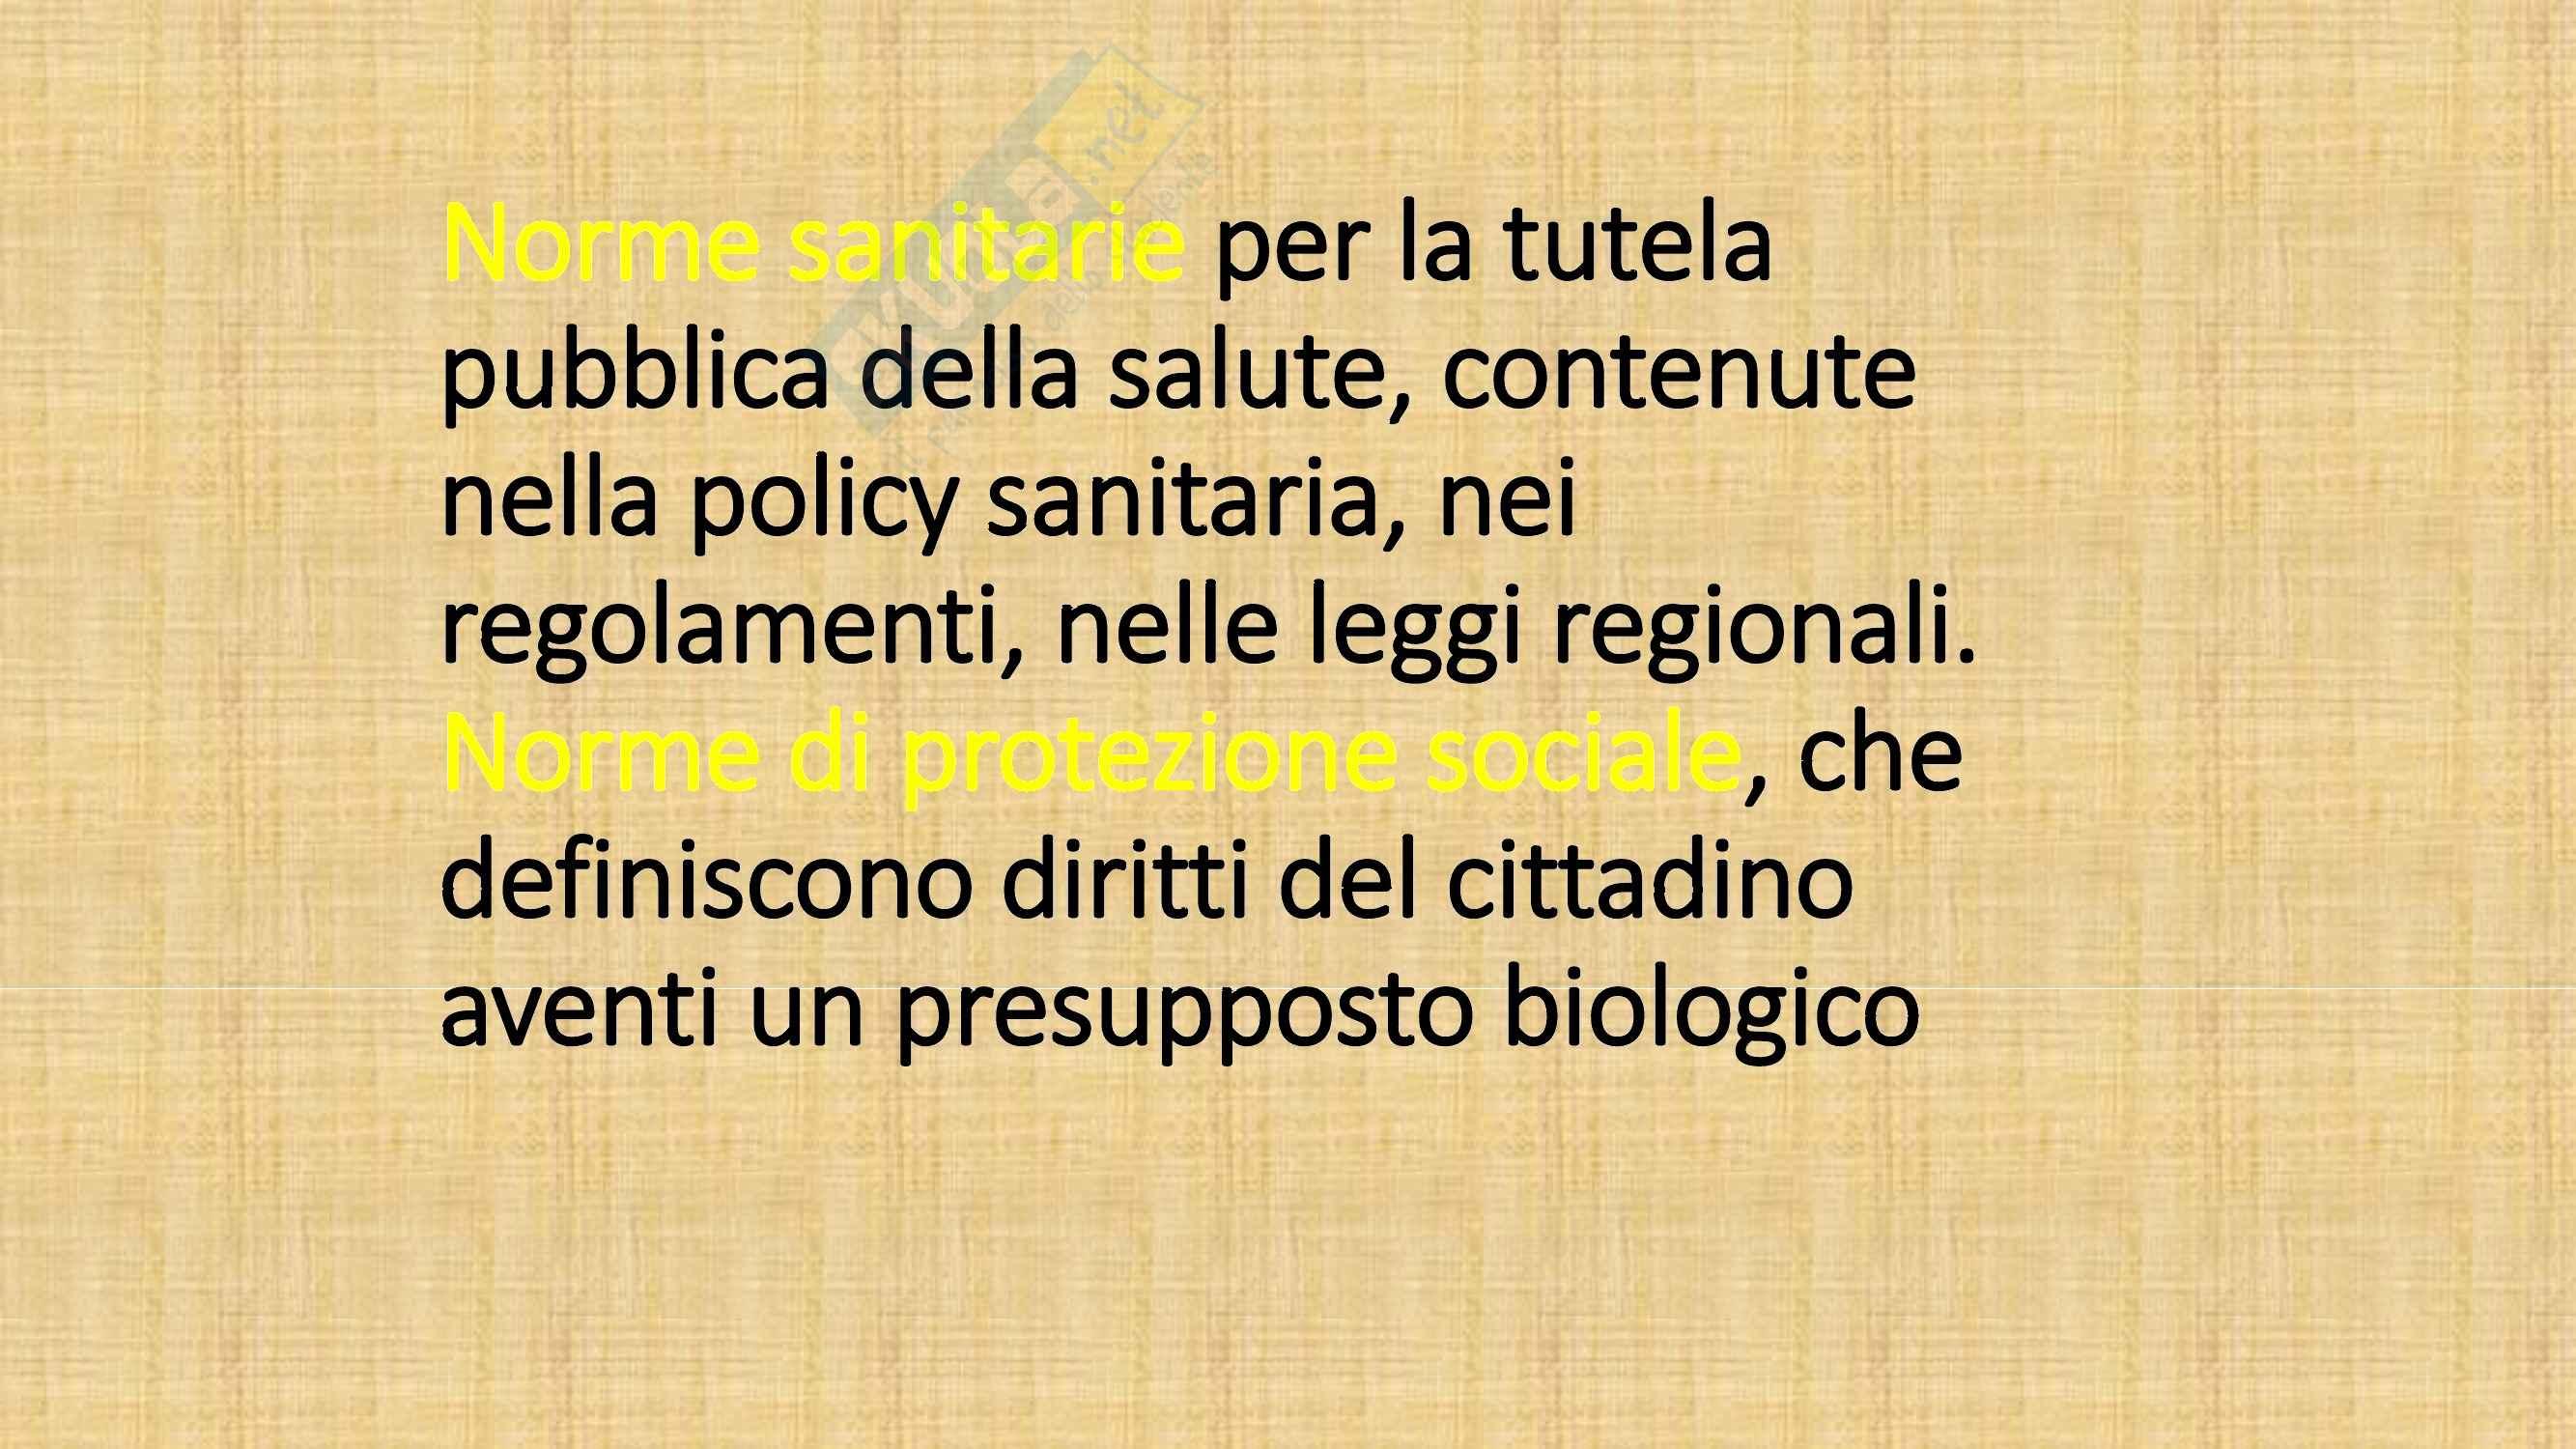 Bioetica - Etica deodontologia Pag. 11